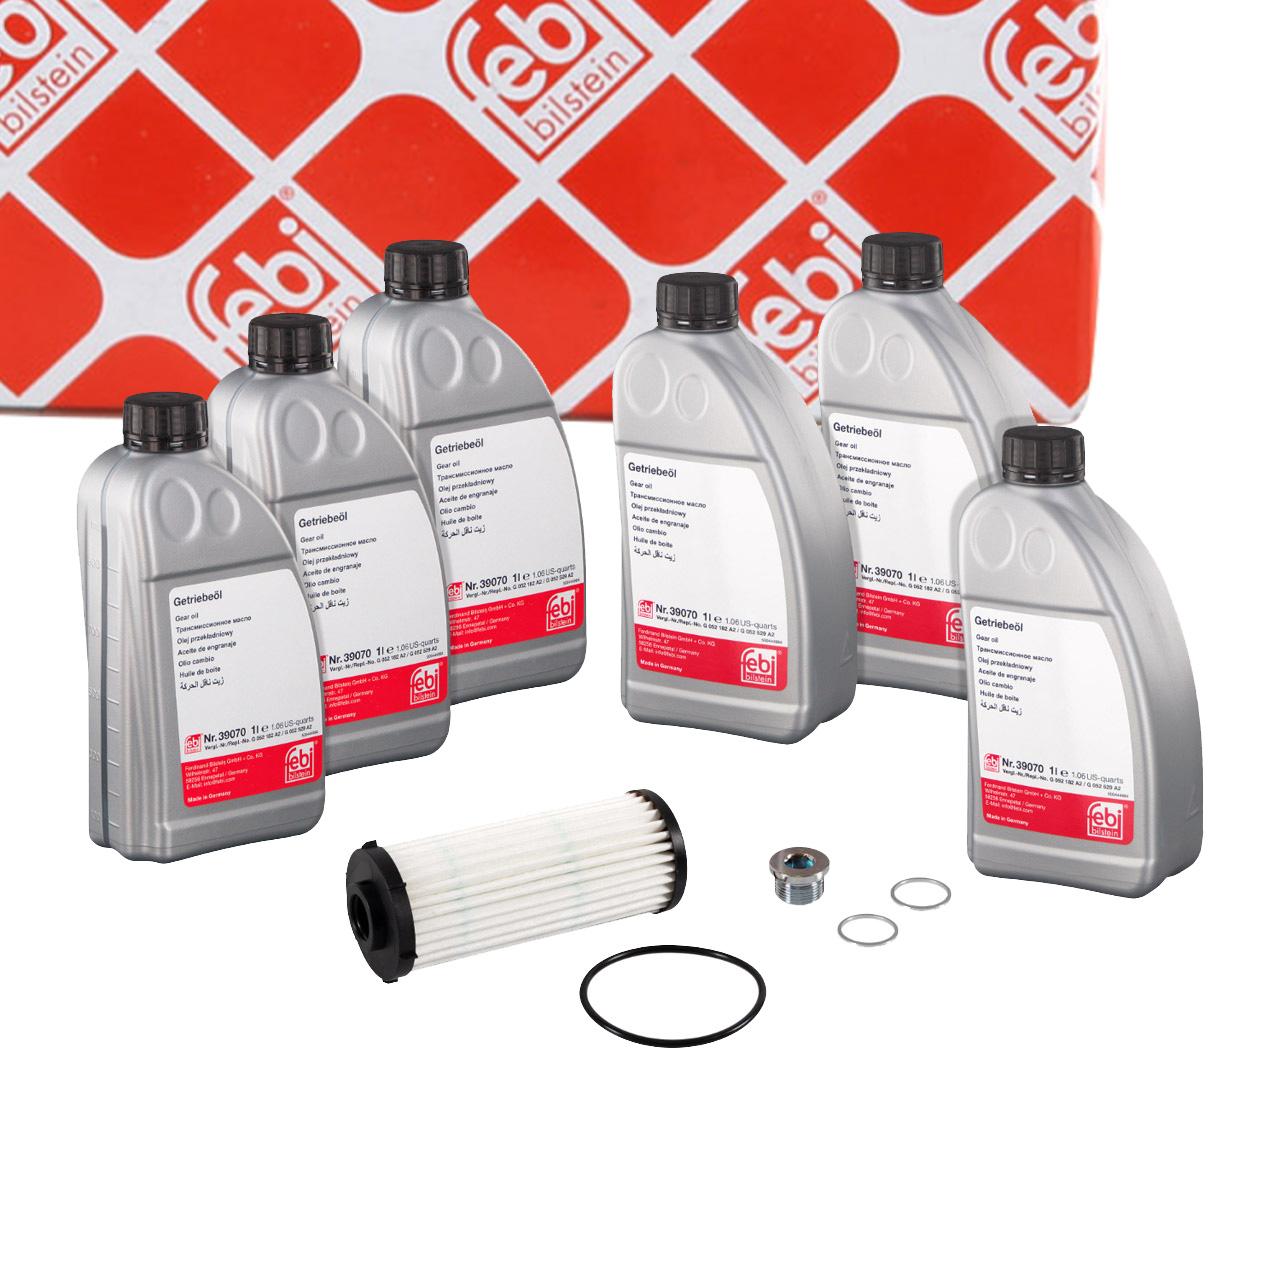 FEBI 171772 Automatikgetriebe Rep.-Satz + 6L Getriebeöl für AUDI VW 7-Gang DSG 02E DQ500